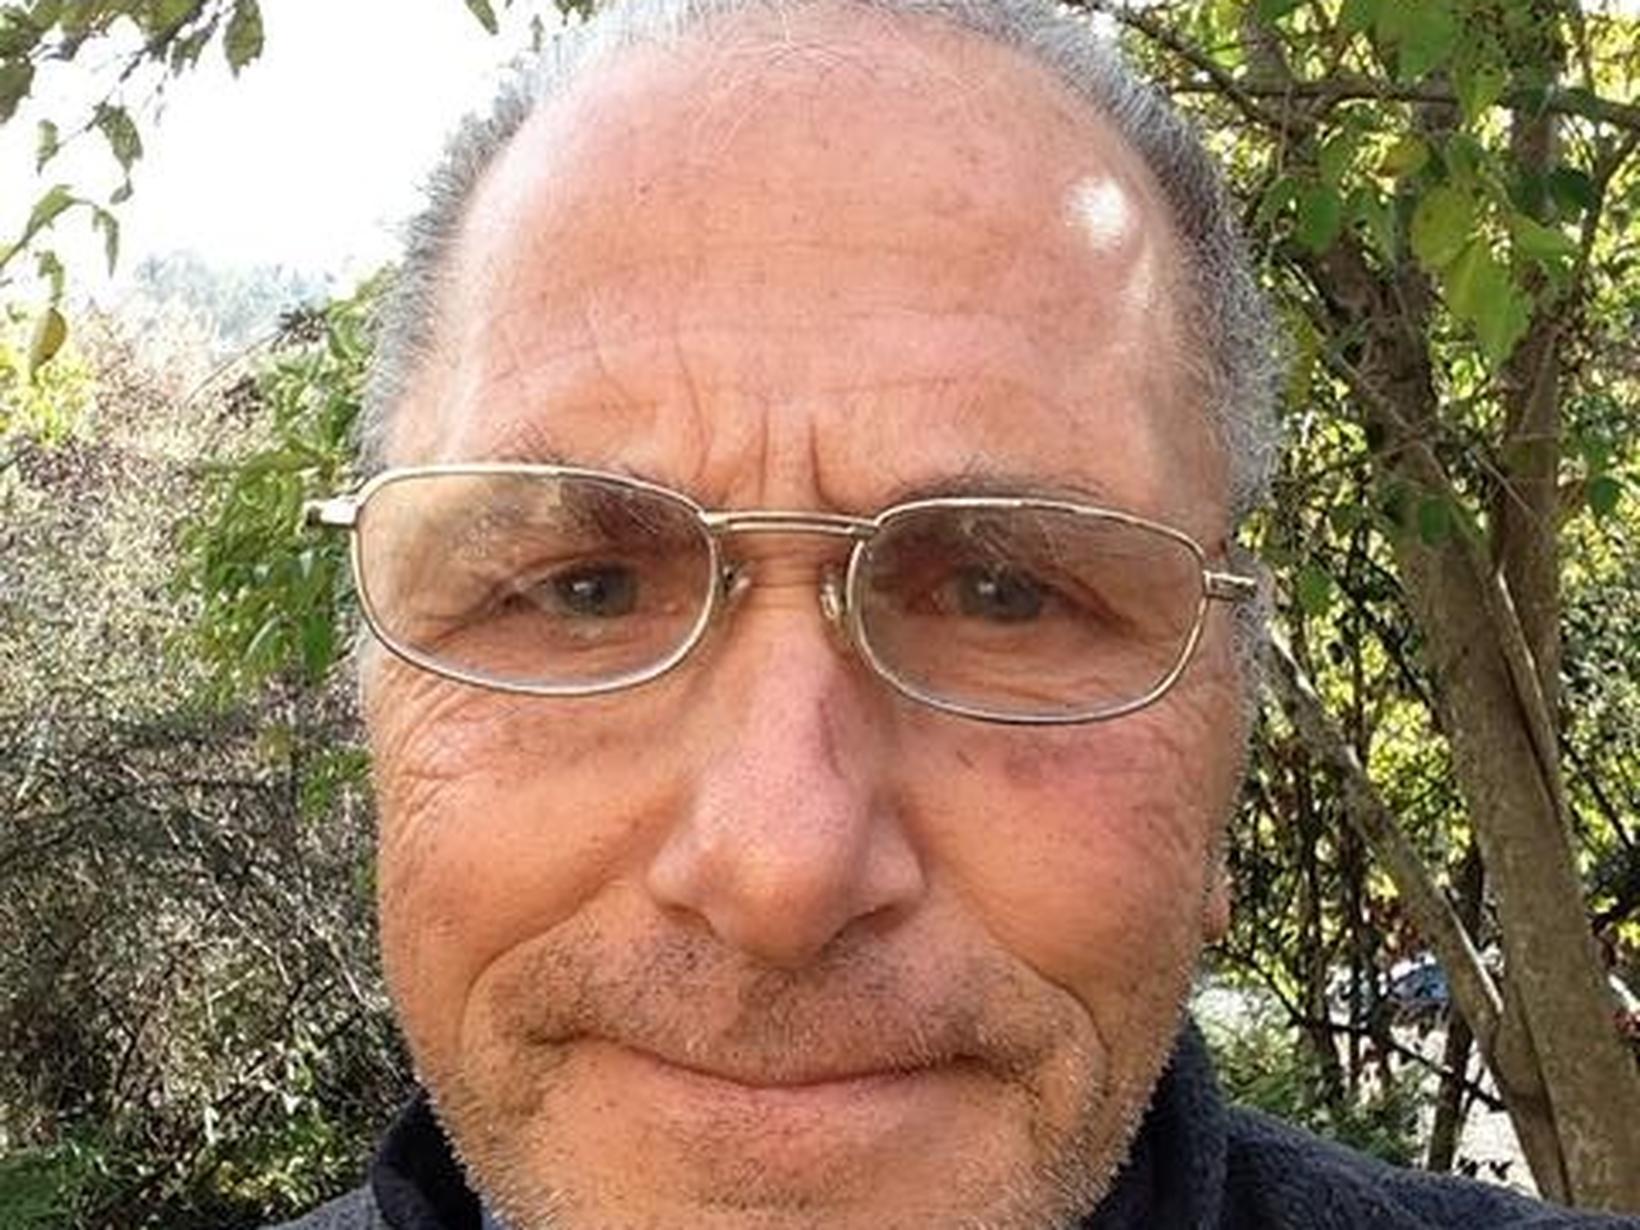 Ralph from Fairfax, California, United States